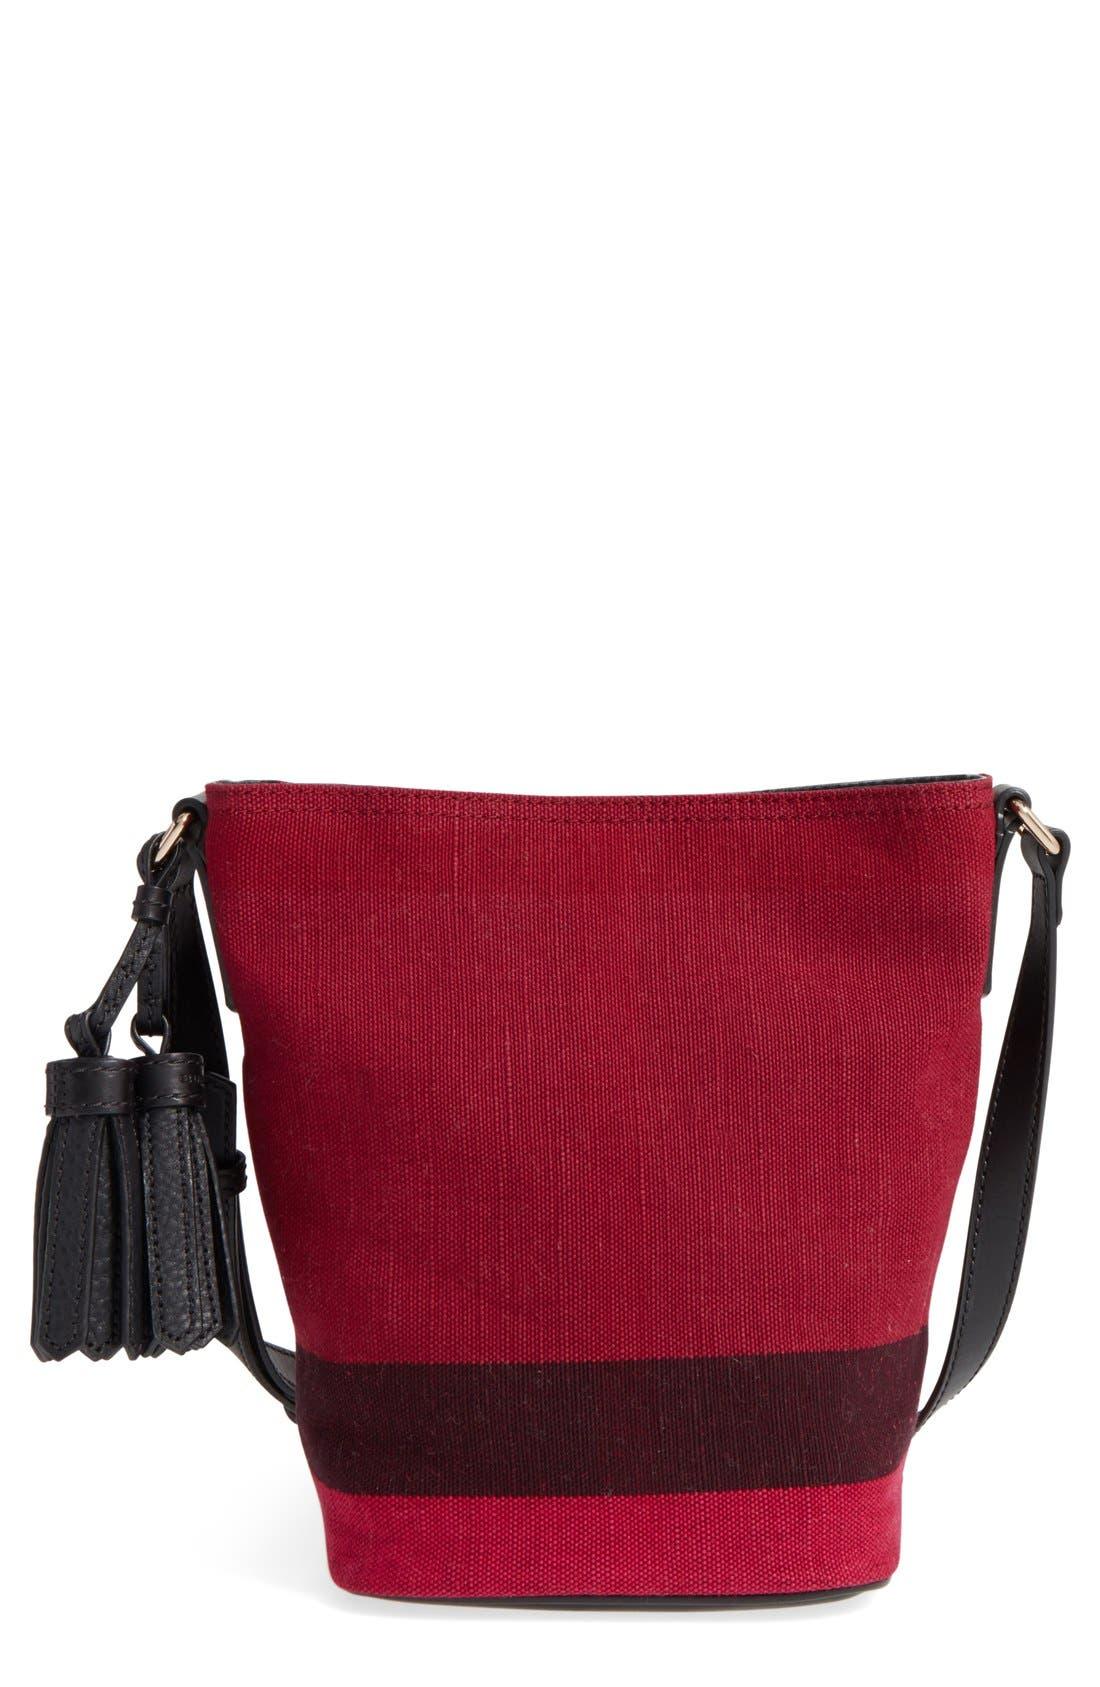 Main Image - Burberry 'Mini Ashby' Bucket Bag